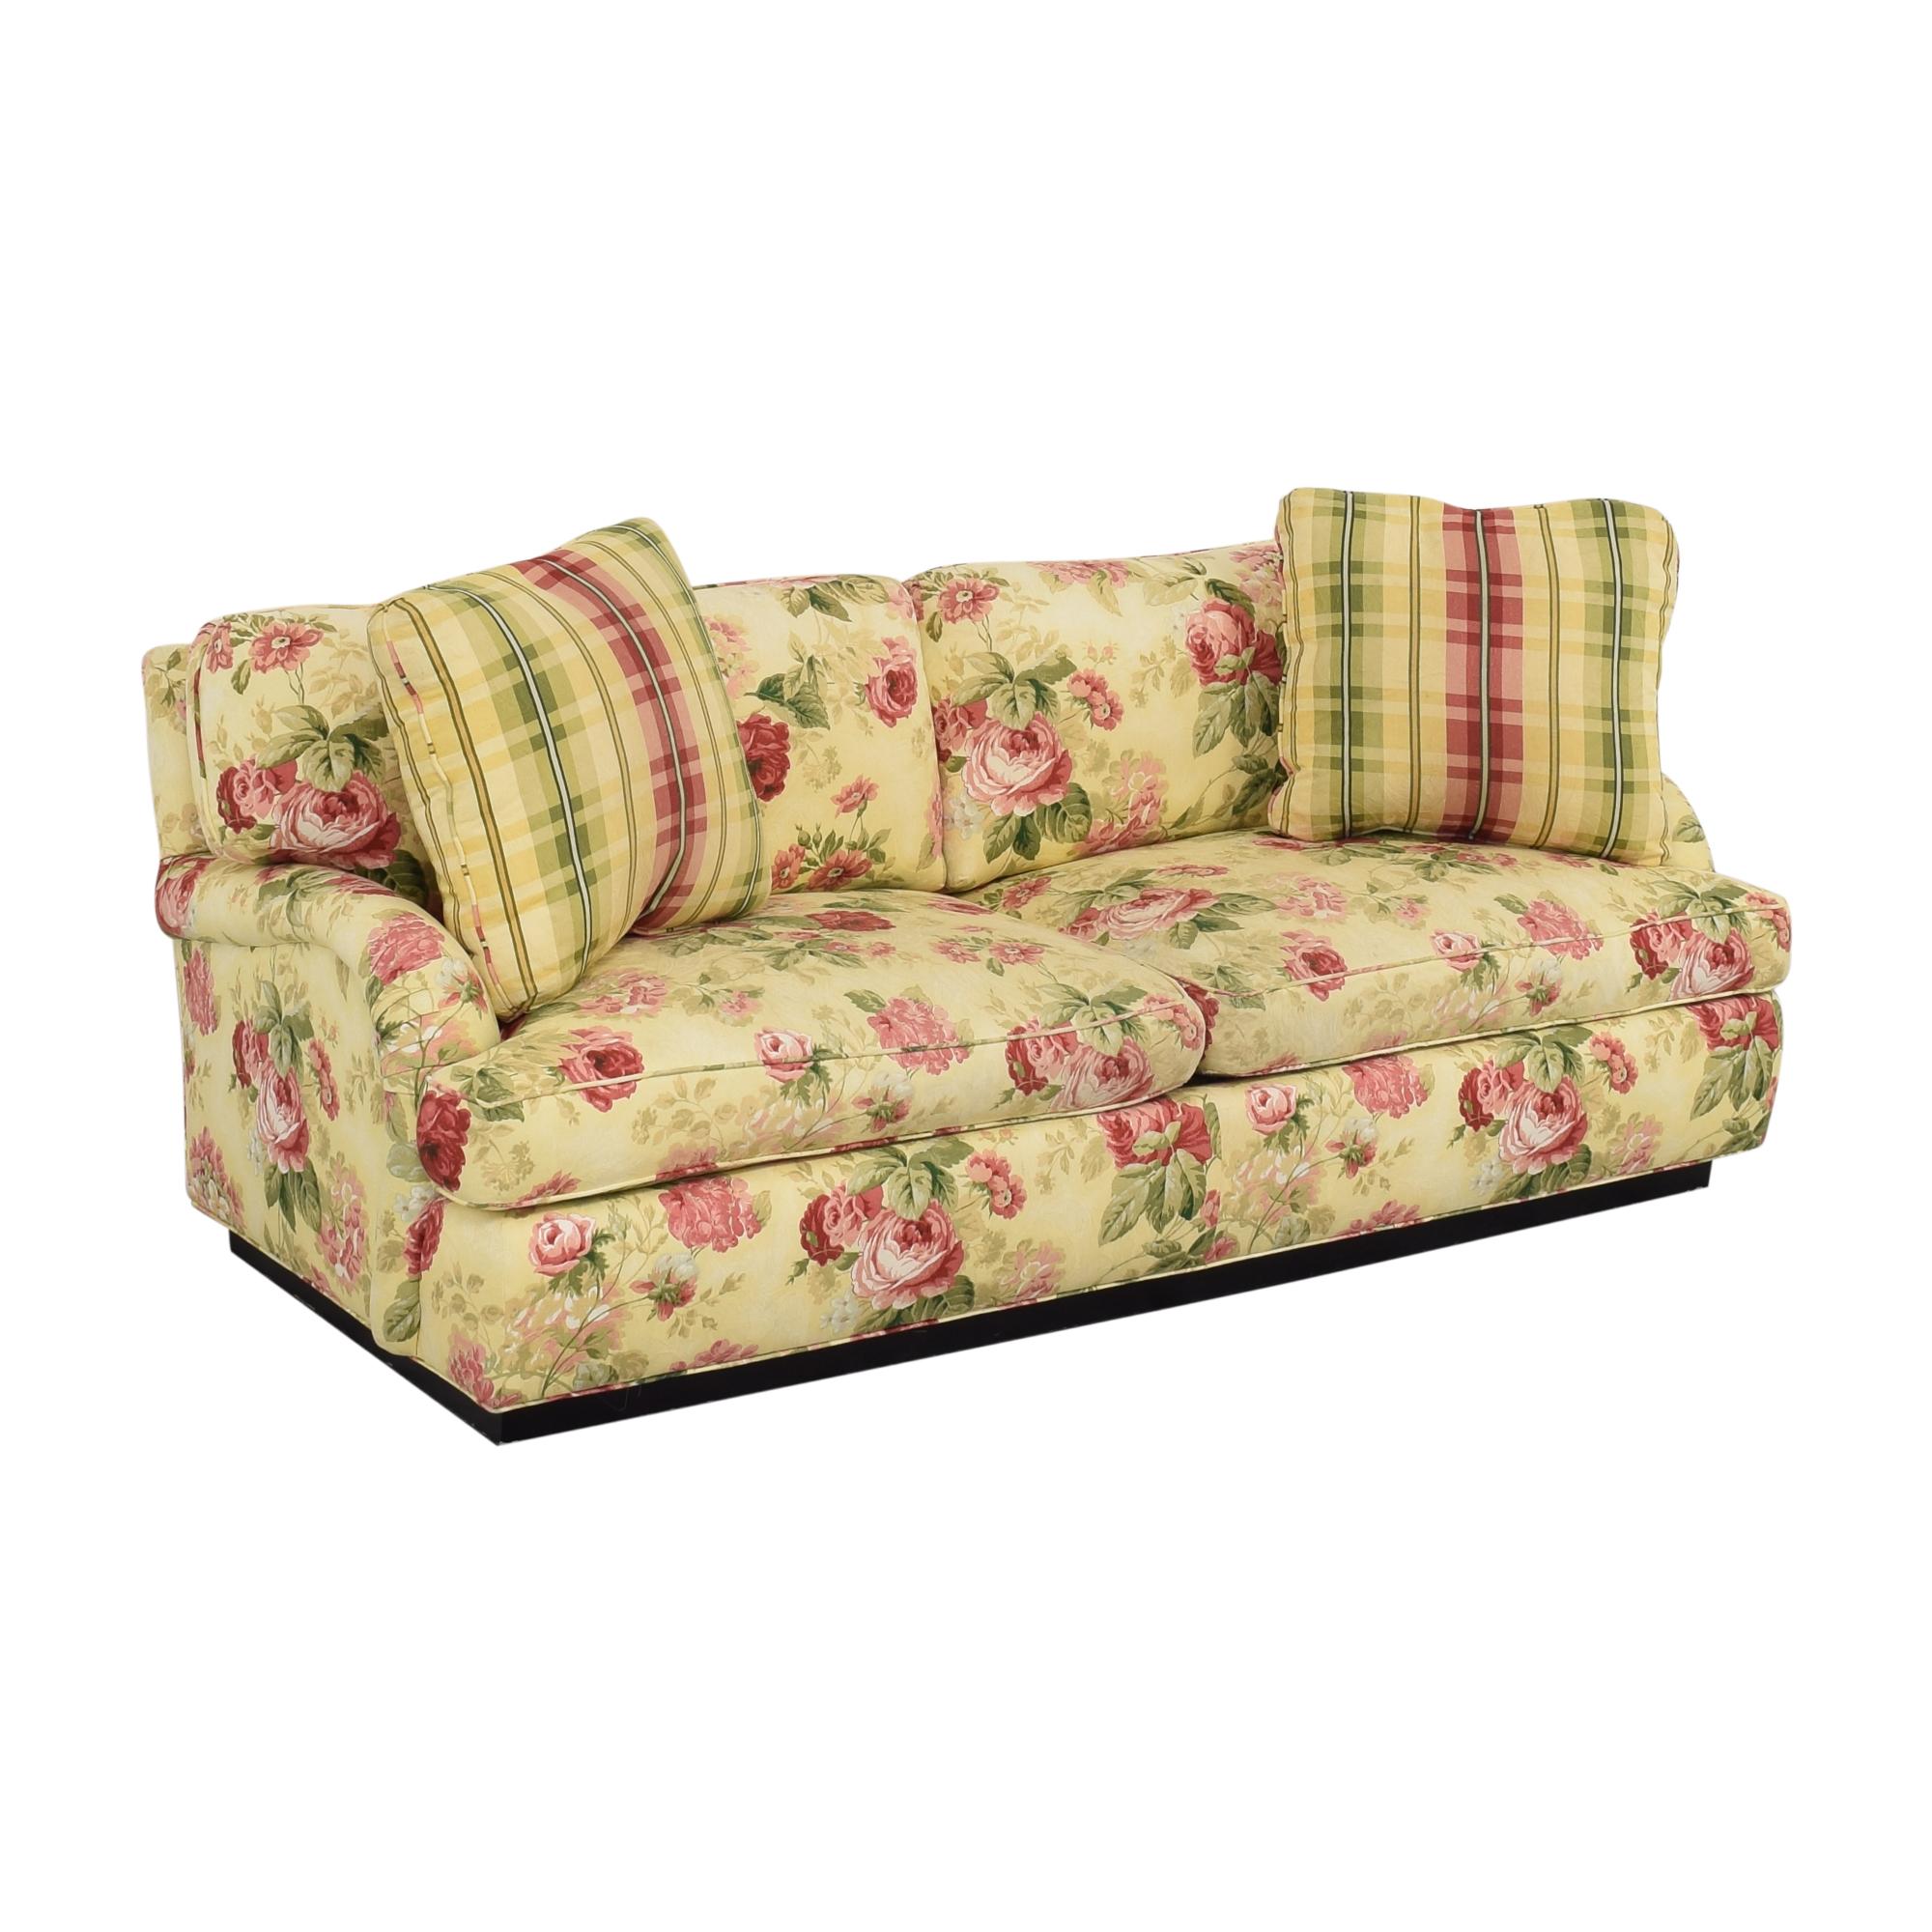 Greenbaum Interiors Greenbaum Two Cushion Sofa coupon